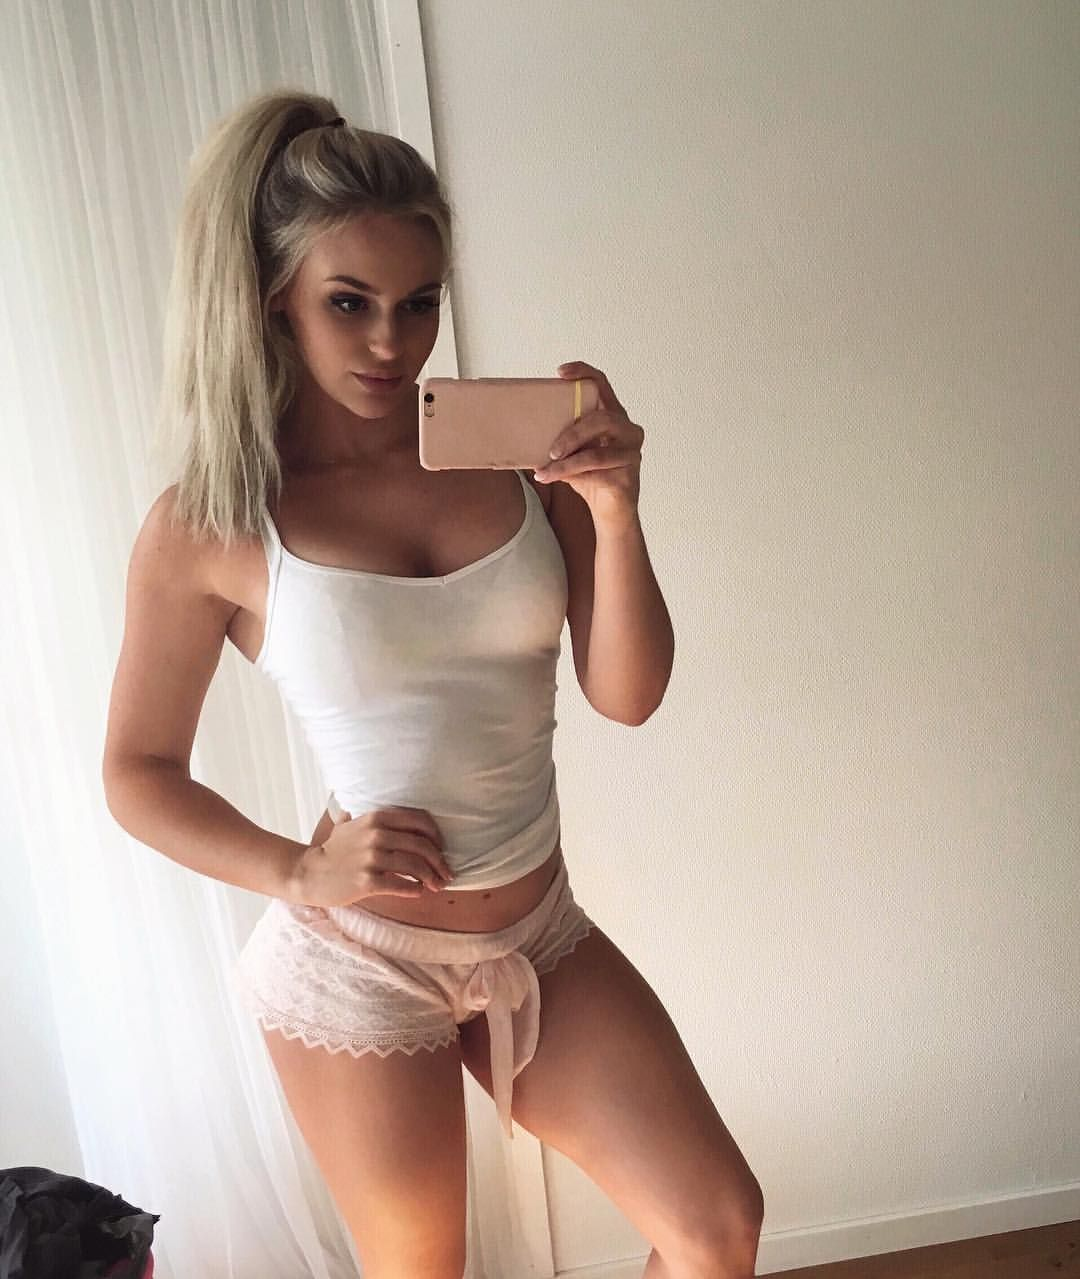 Instagram otrohet sex i Stockholm